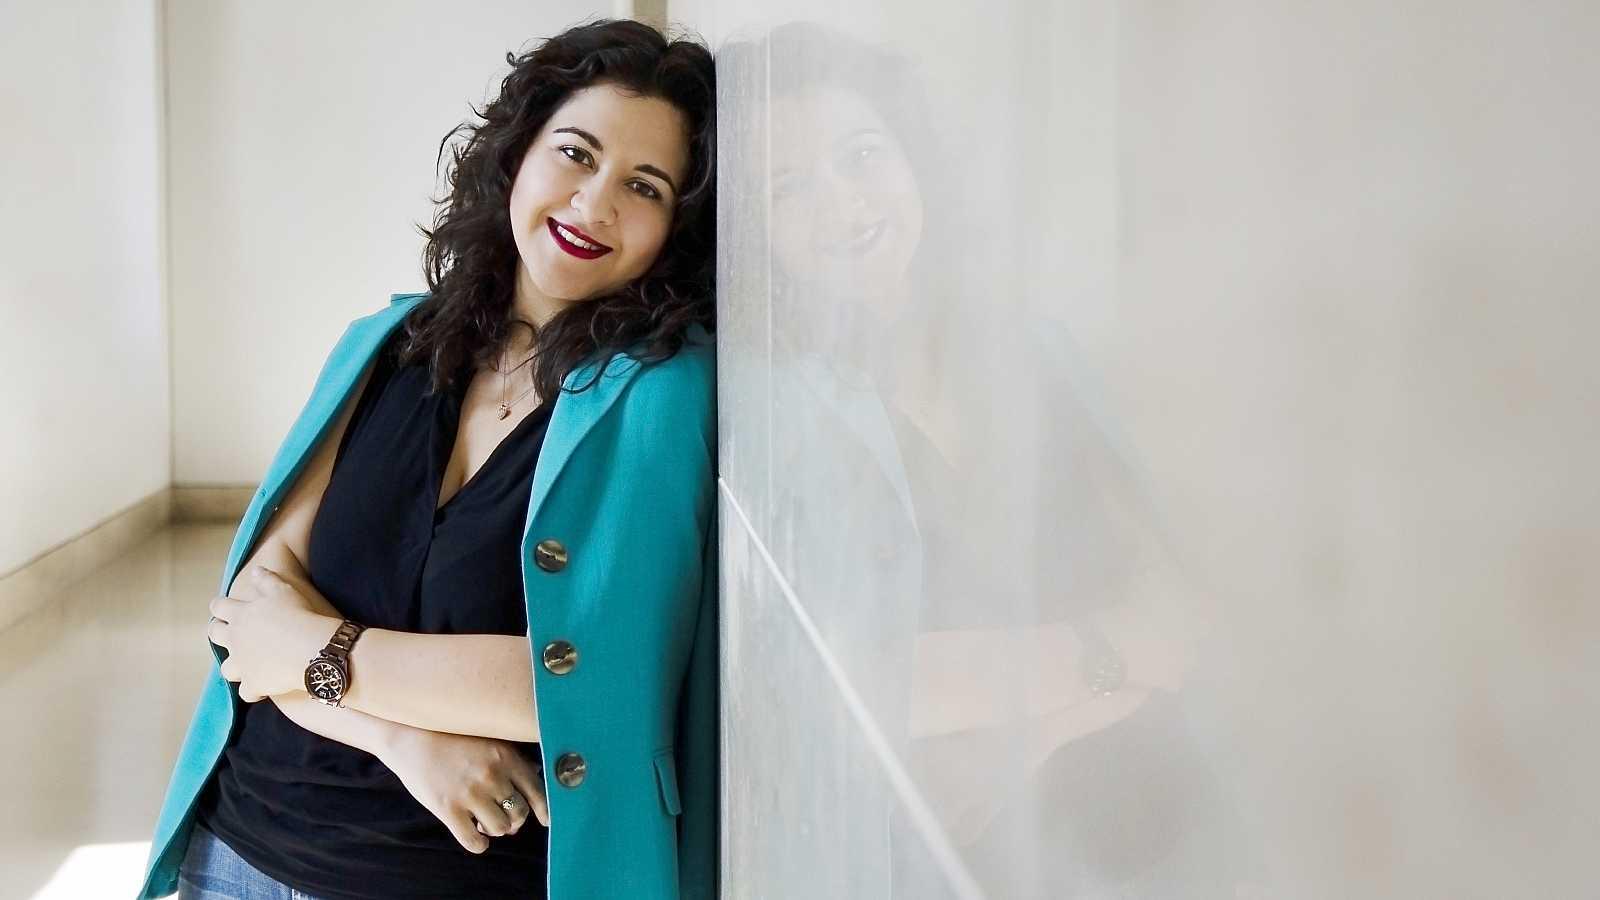 Adriana González - 'Mèlodies' - escuchar ahora